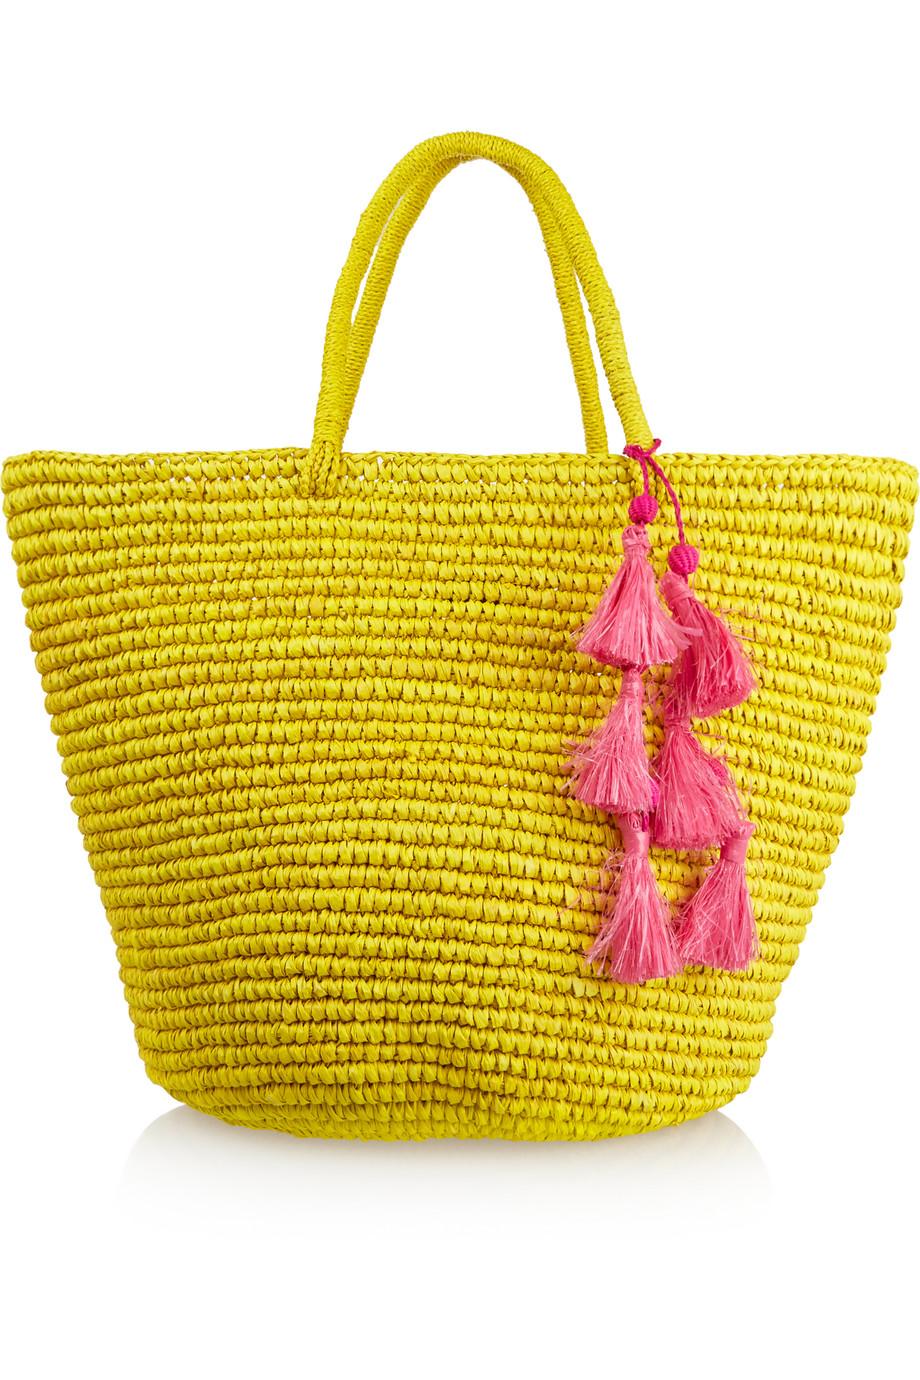 Sensi Studio Maxi Woven Toquilla Straw Tote, Yellow, Women's